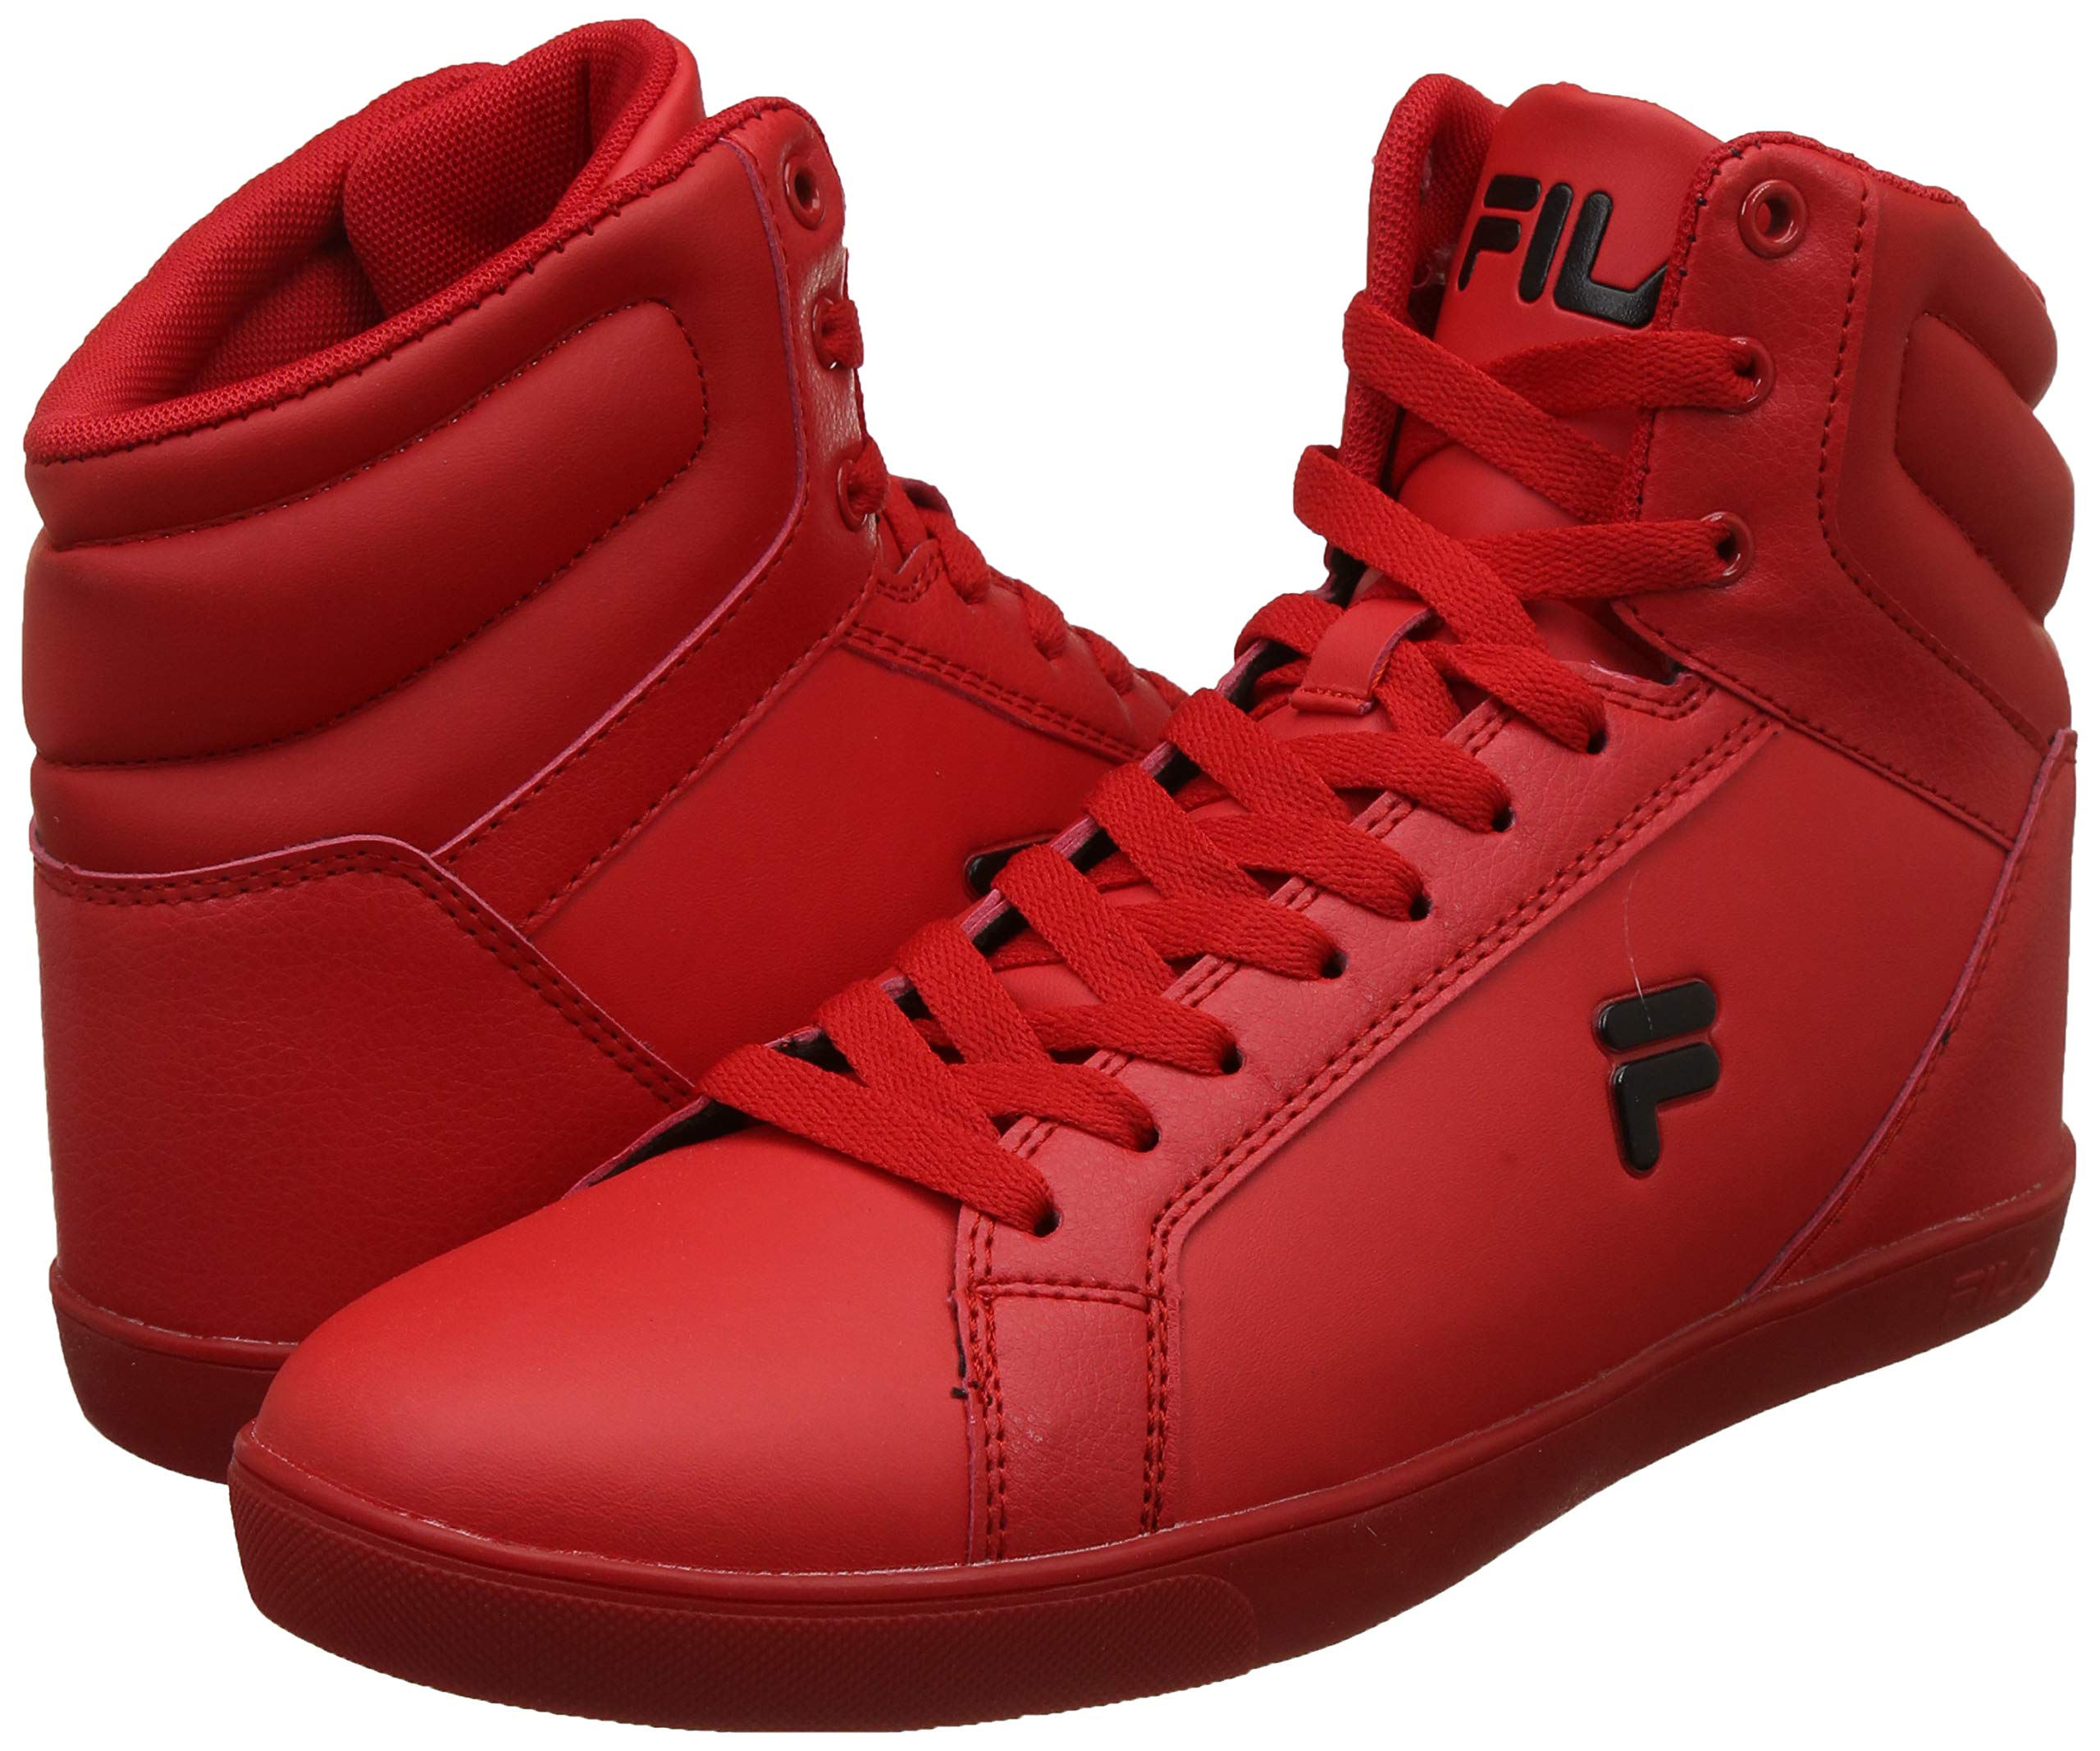 Men's Kolton Sneakers- Buy Online in